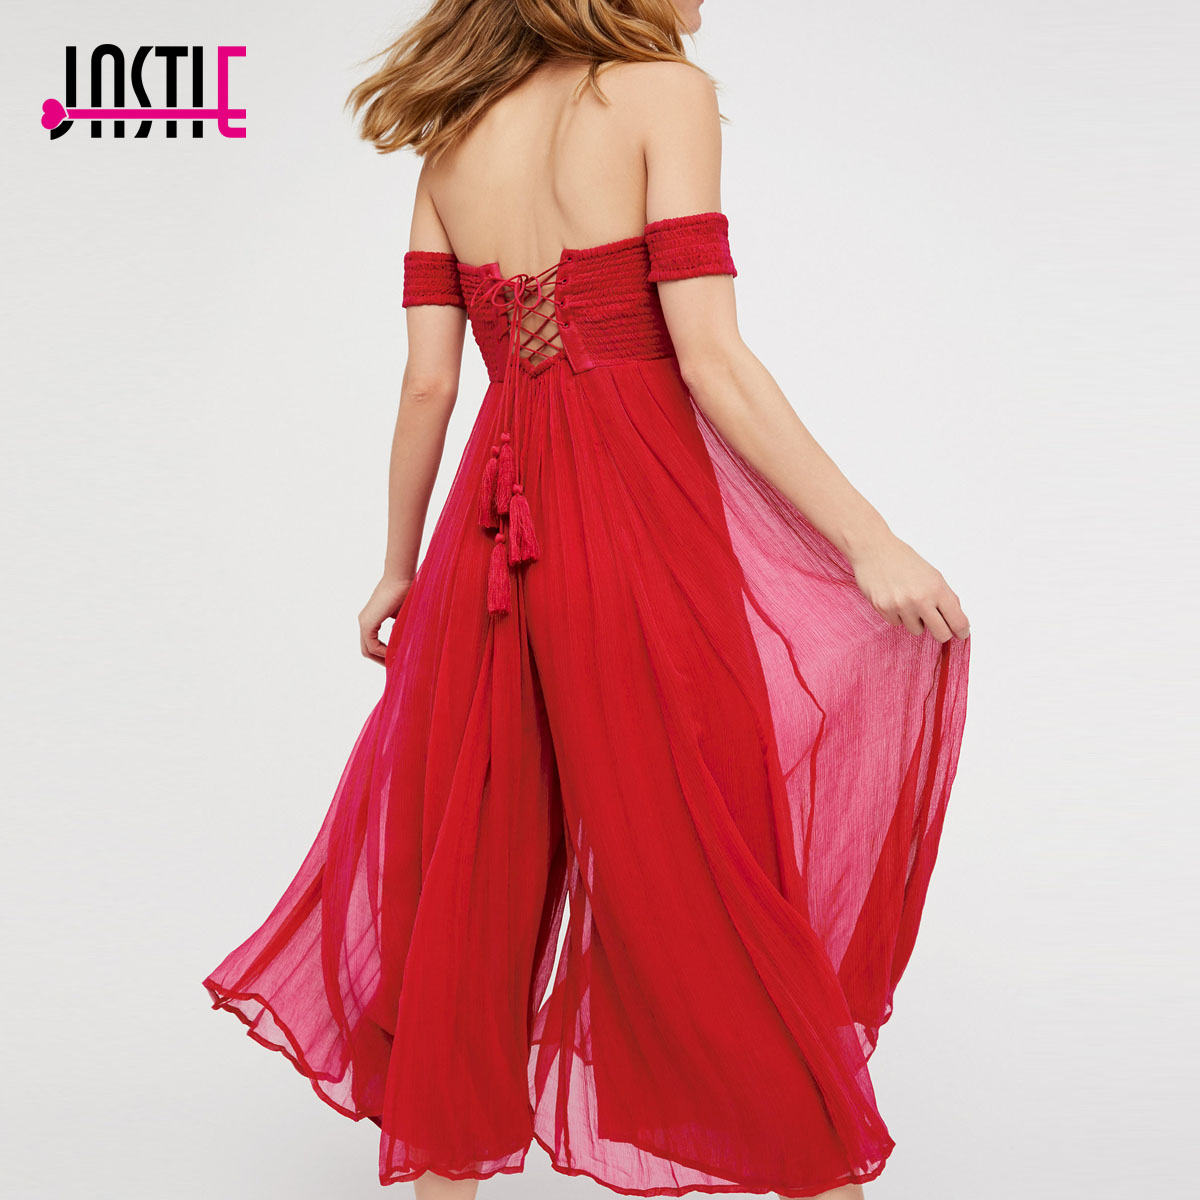 Jastie Off-The-Shoulder Jumpsuit Crinkle Chiffon Wide Leg Overalls Elastic Top Playsuits Rompers Lace-up Back Women Jumpsuit white lace details off shoulder playsuits with belt